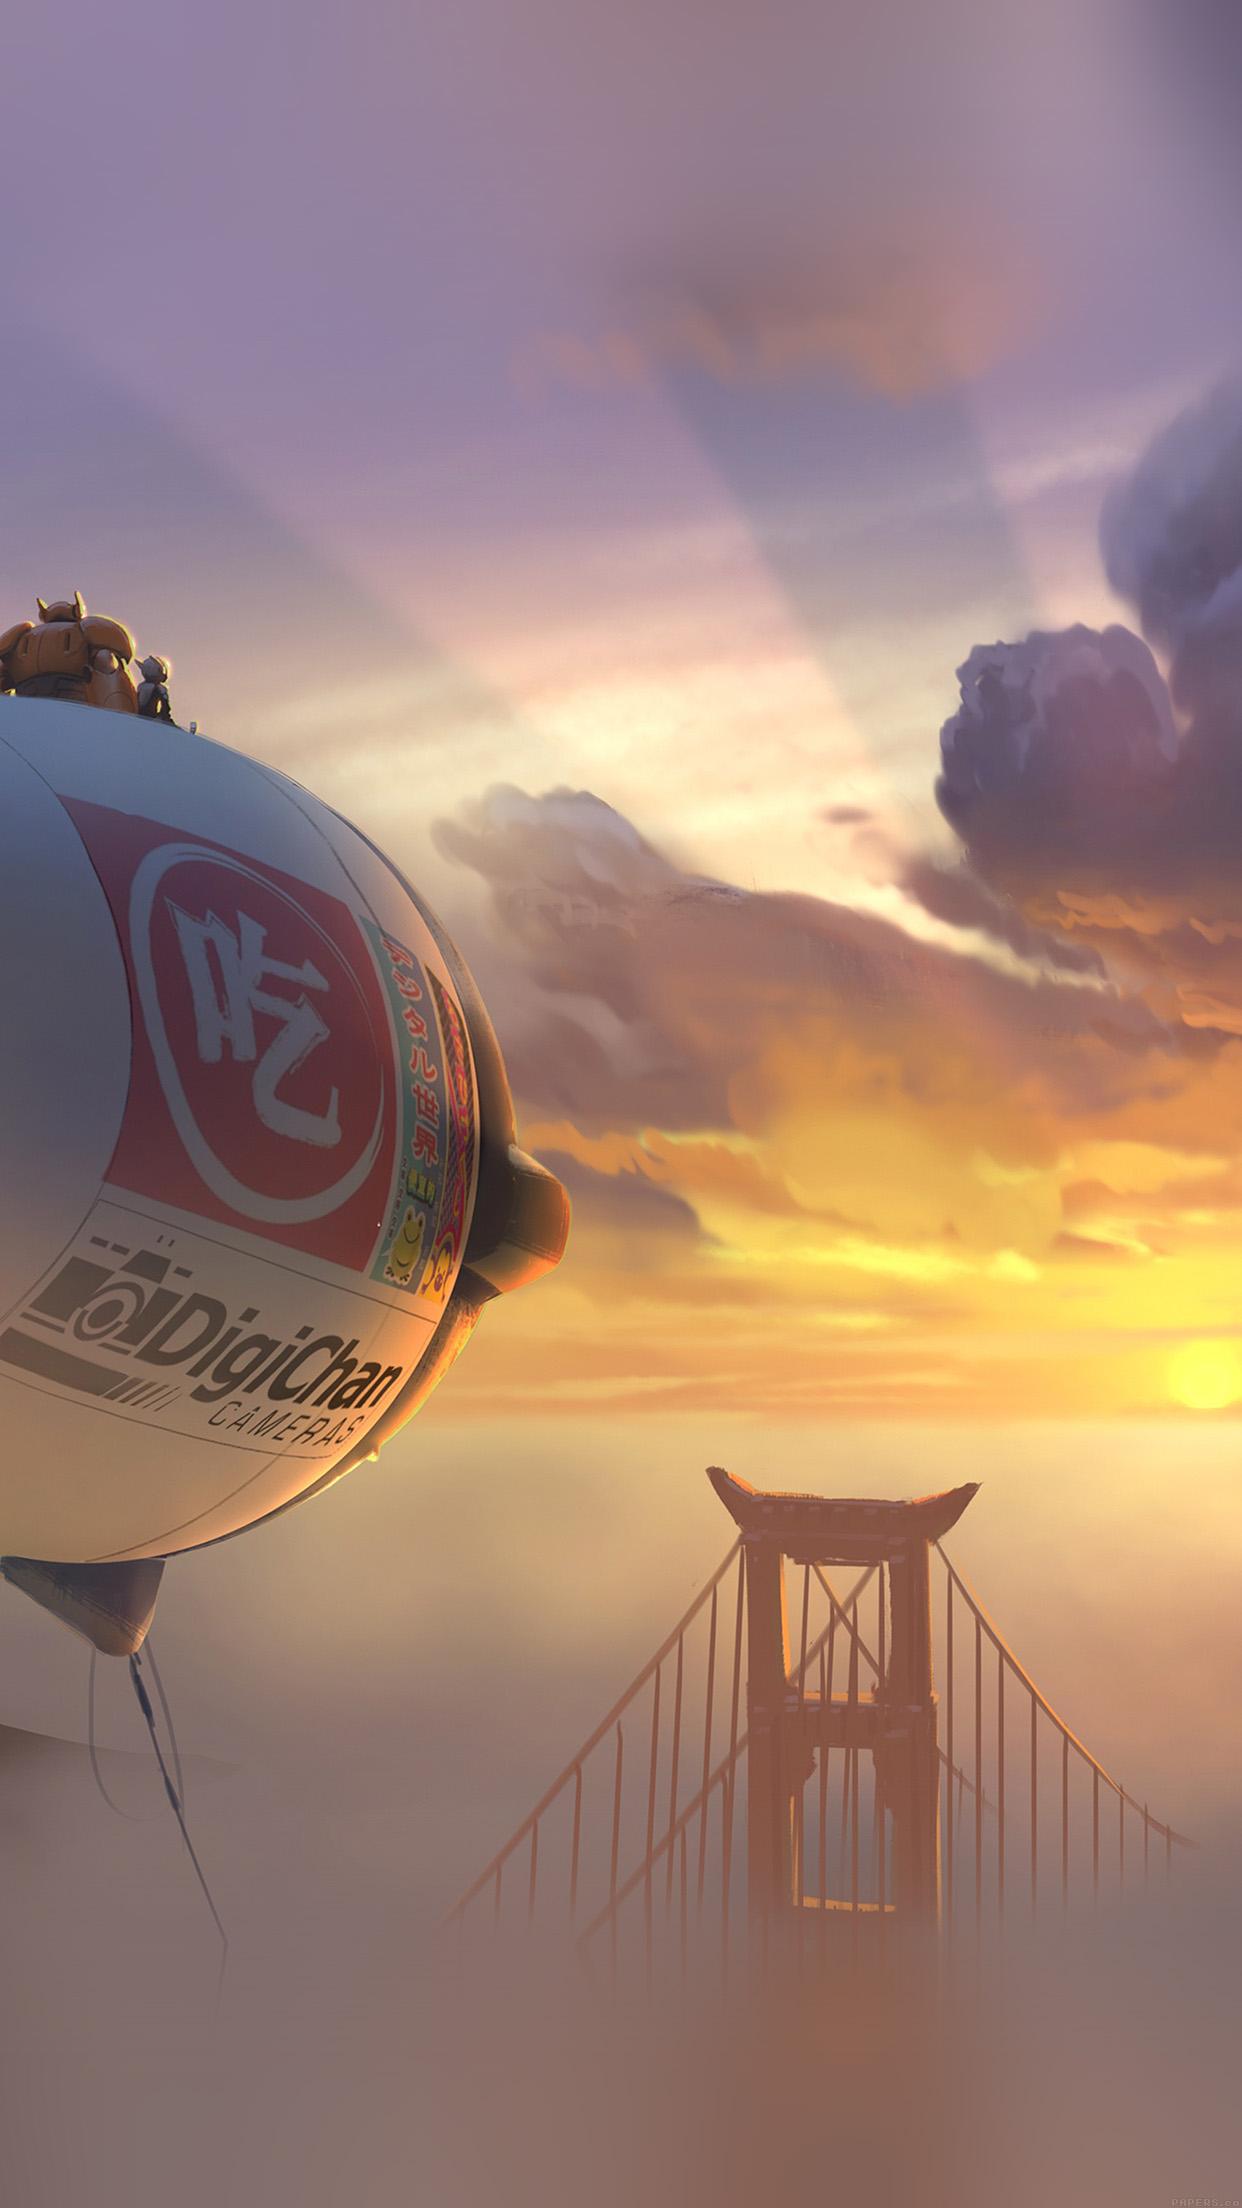 Papers Co Iphone Wallpaper Af88 Big Hero 6 Fly Air Disney Art Illust